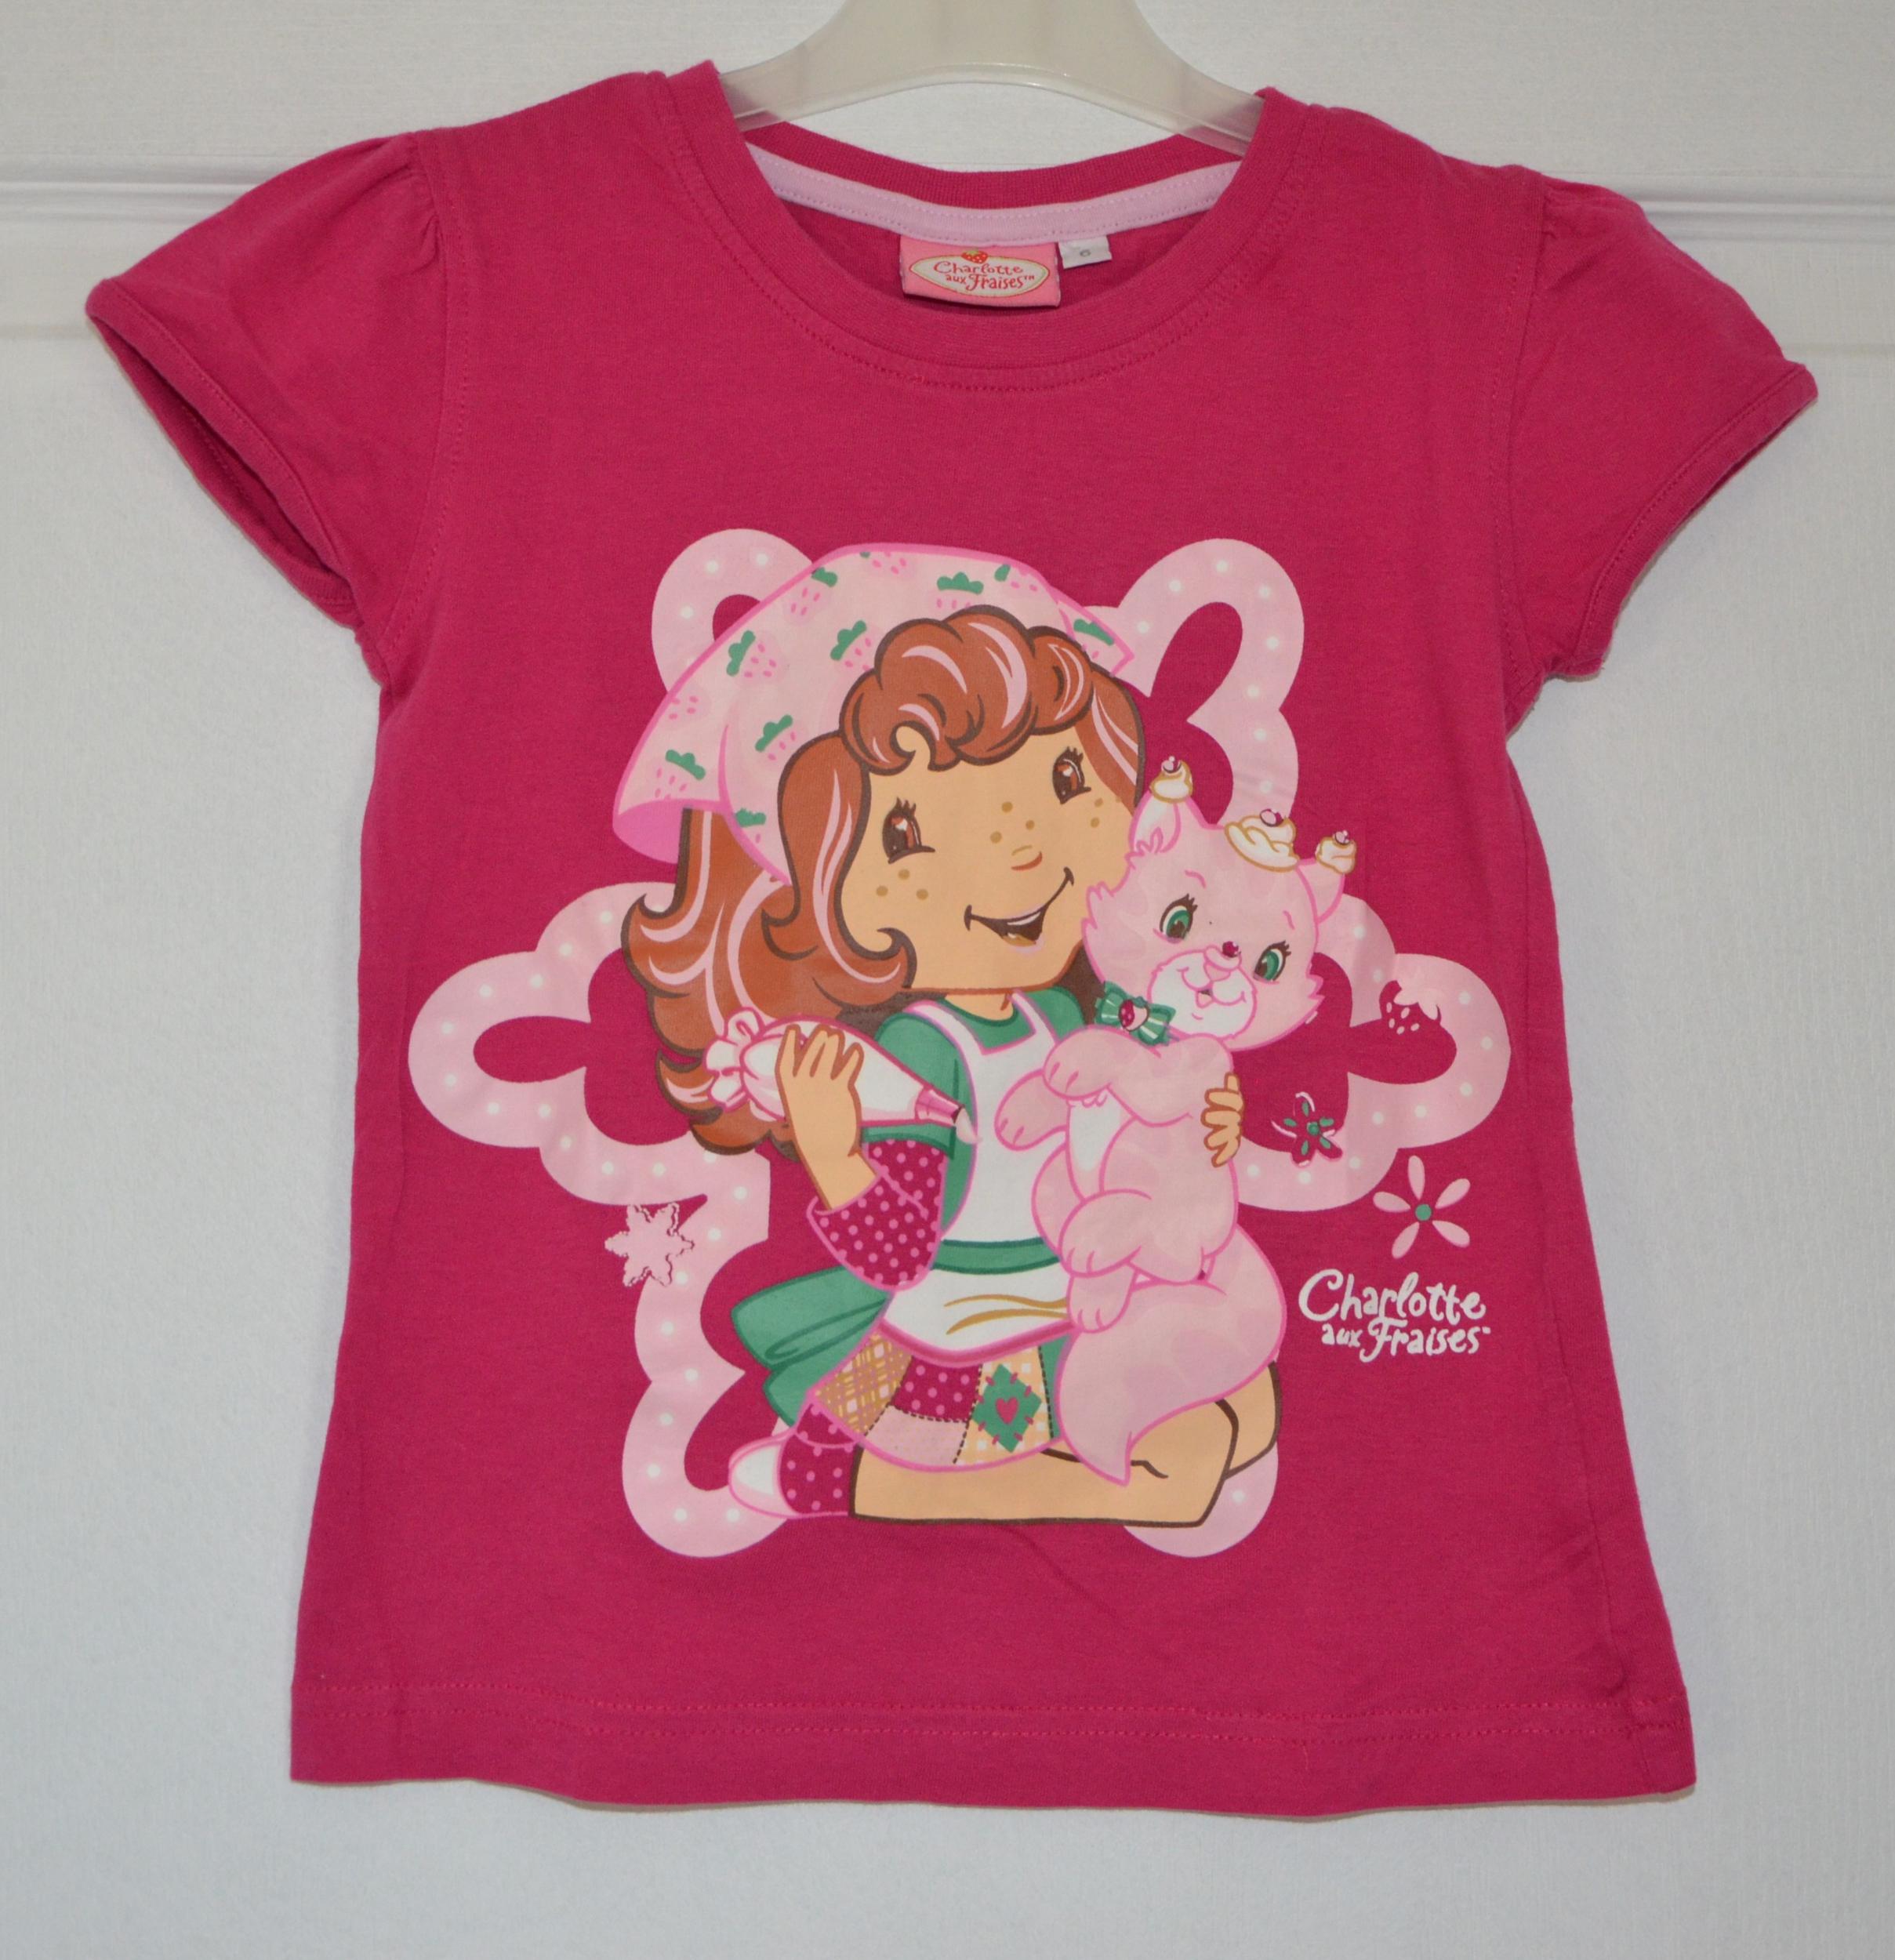 tee shirt rose charlotte aux fraises fille 6 ans charlotte aux fraises